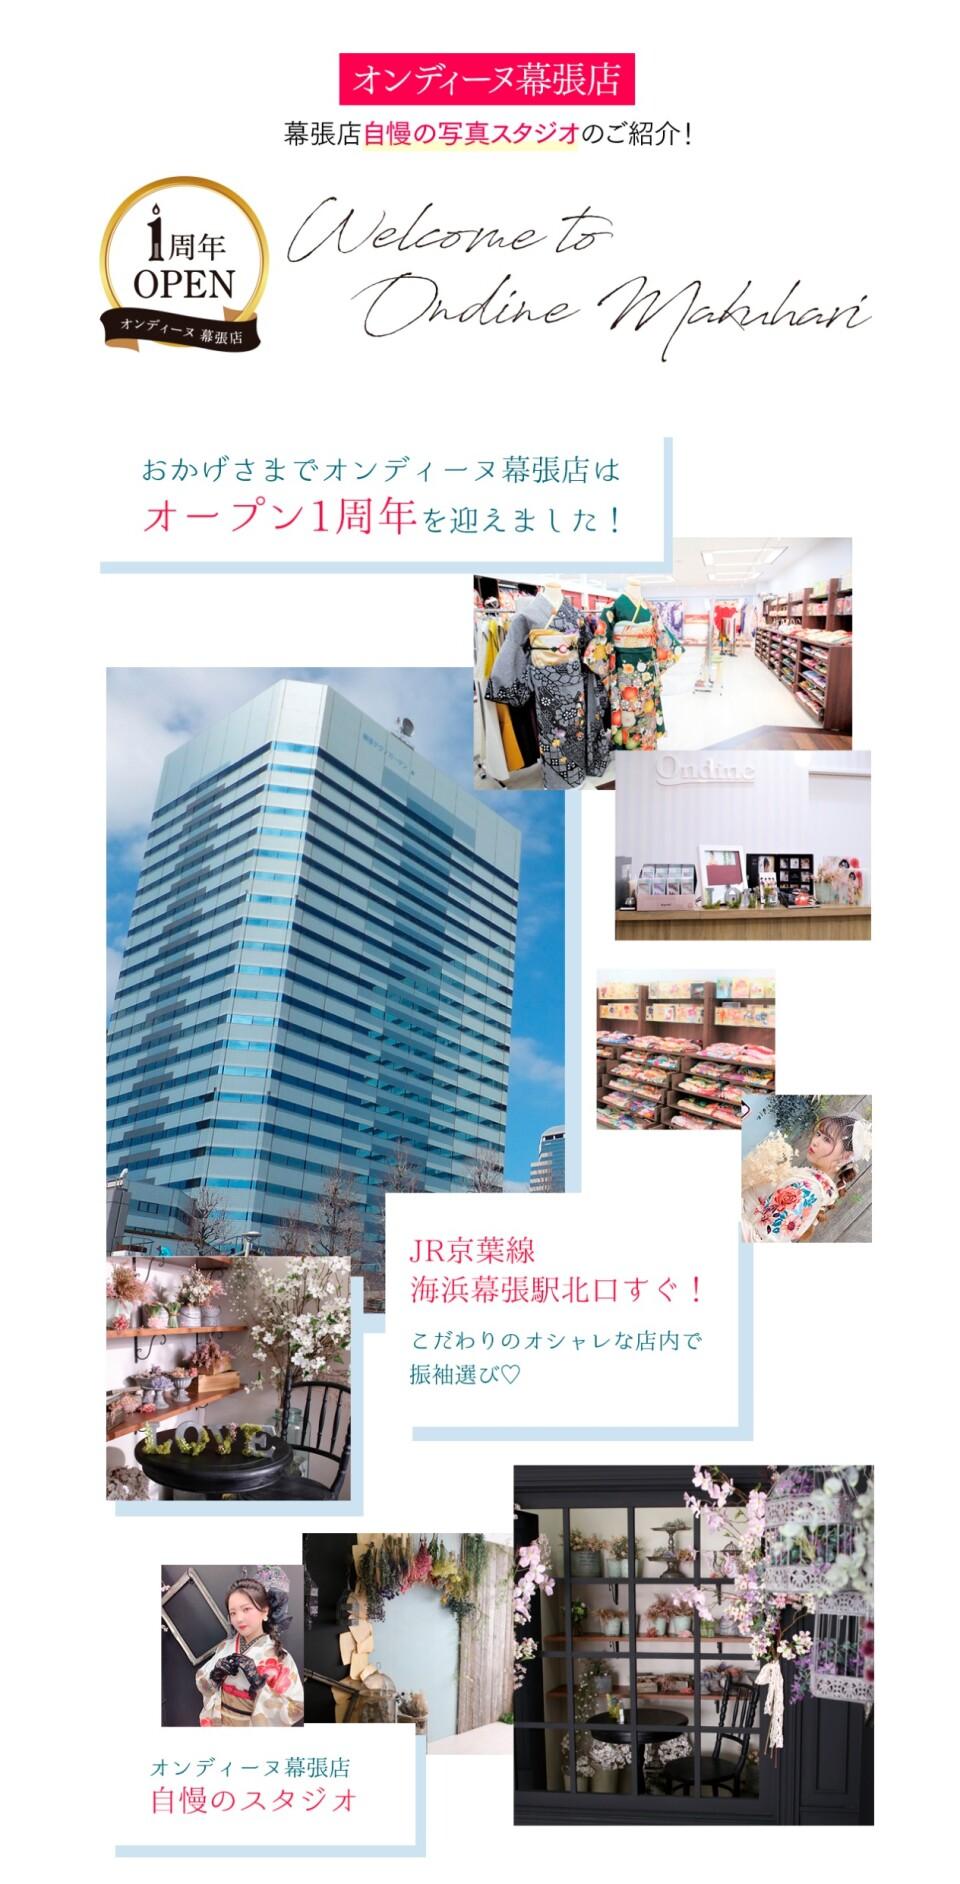 FireShot Capture 608 - 川崎・幕張OPEN1周年記念 開催中!|成人式の振袖レンタル・販売オンディーヌ - www.ondine.jp